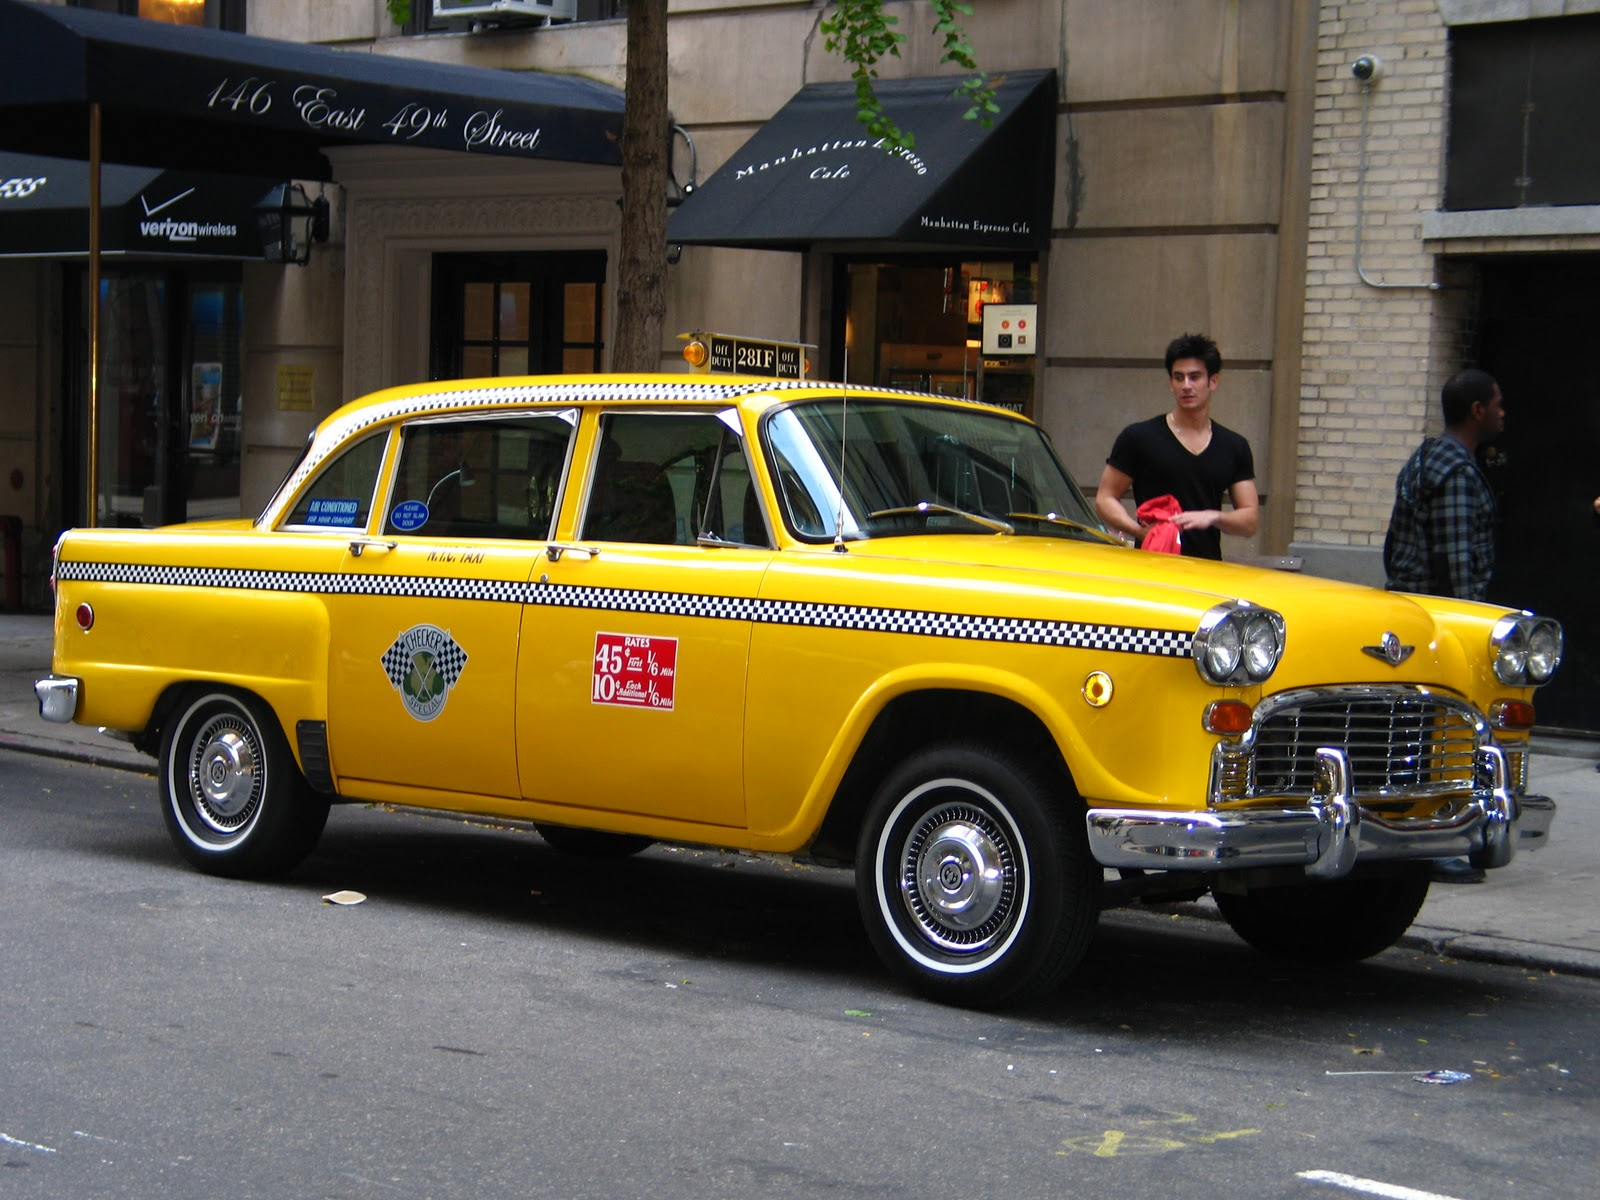 Checker cabs photos reviews news specs buy car - Order a cab ...